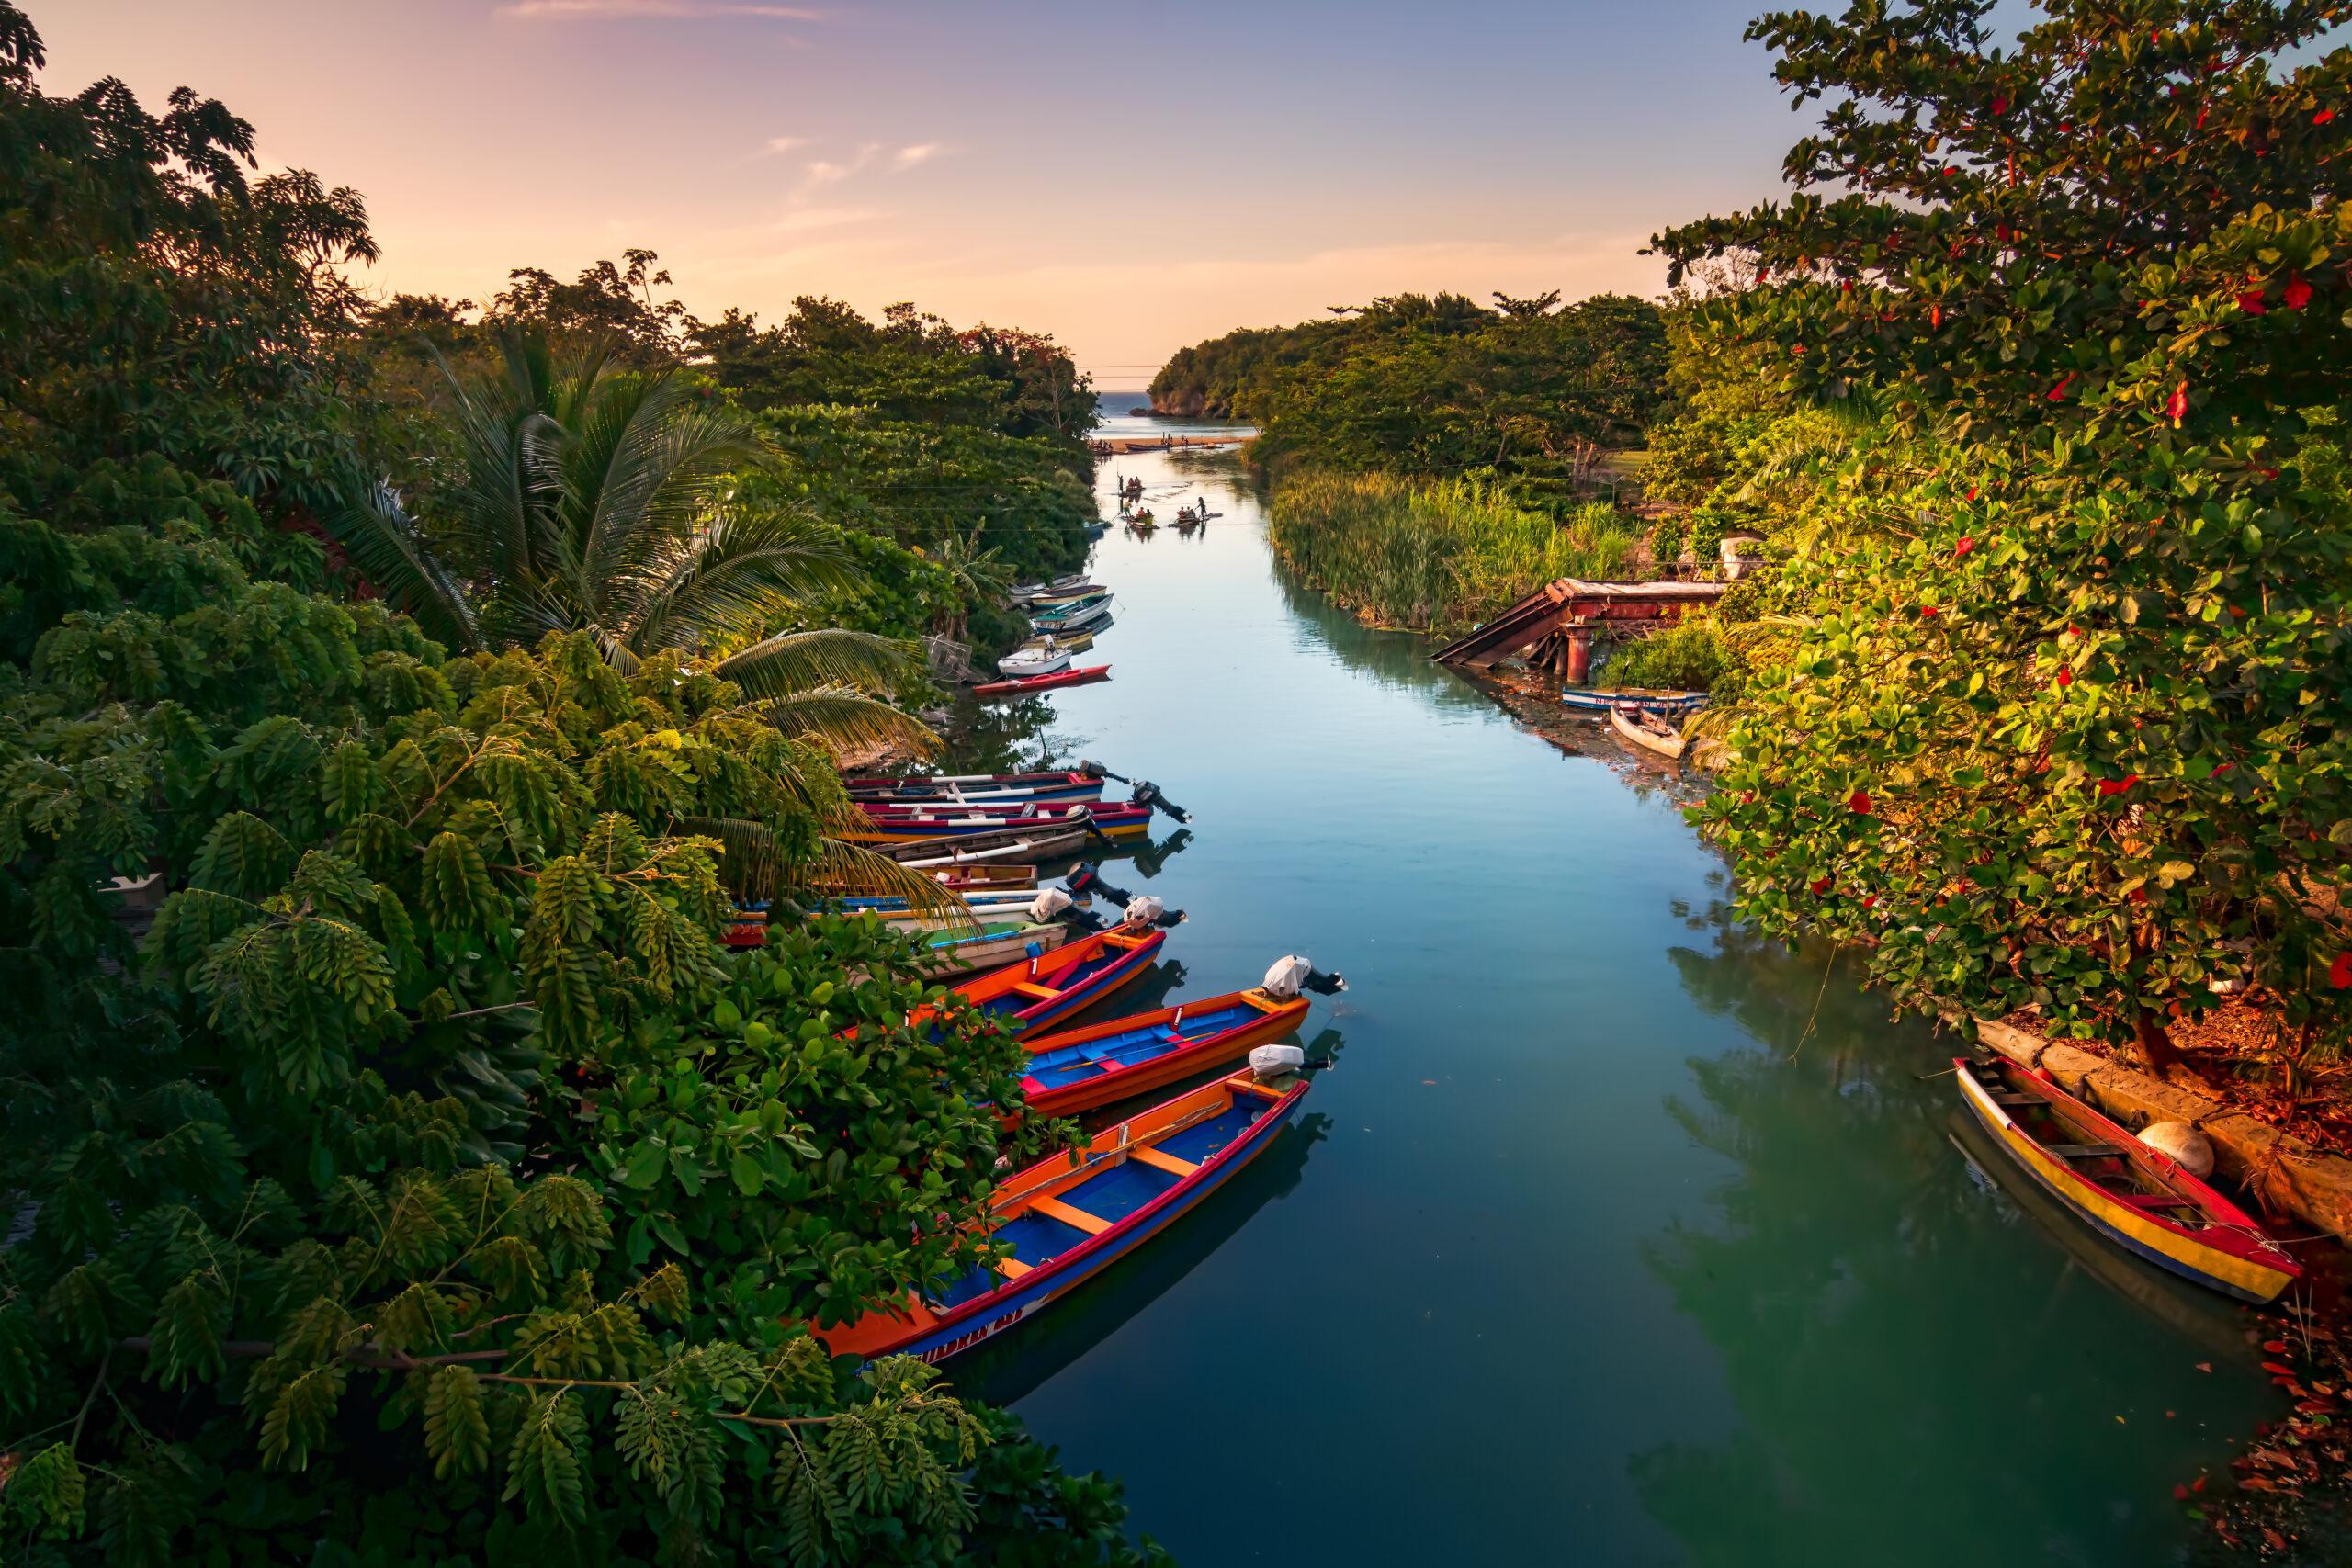 Fishermen boats docked on the White River in St Ann, Jamaica.